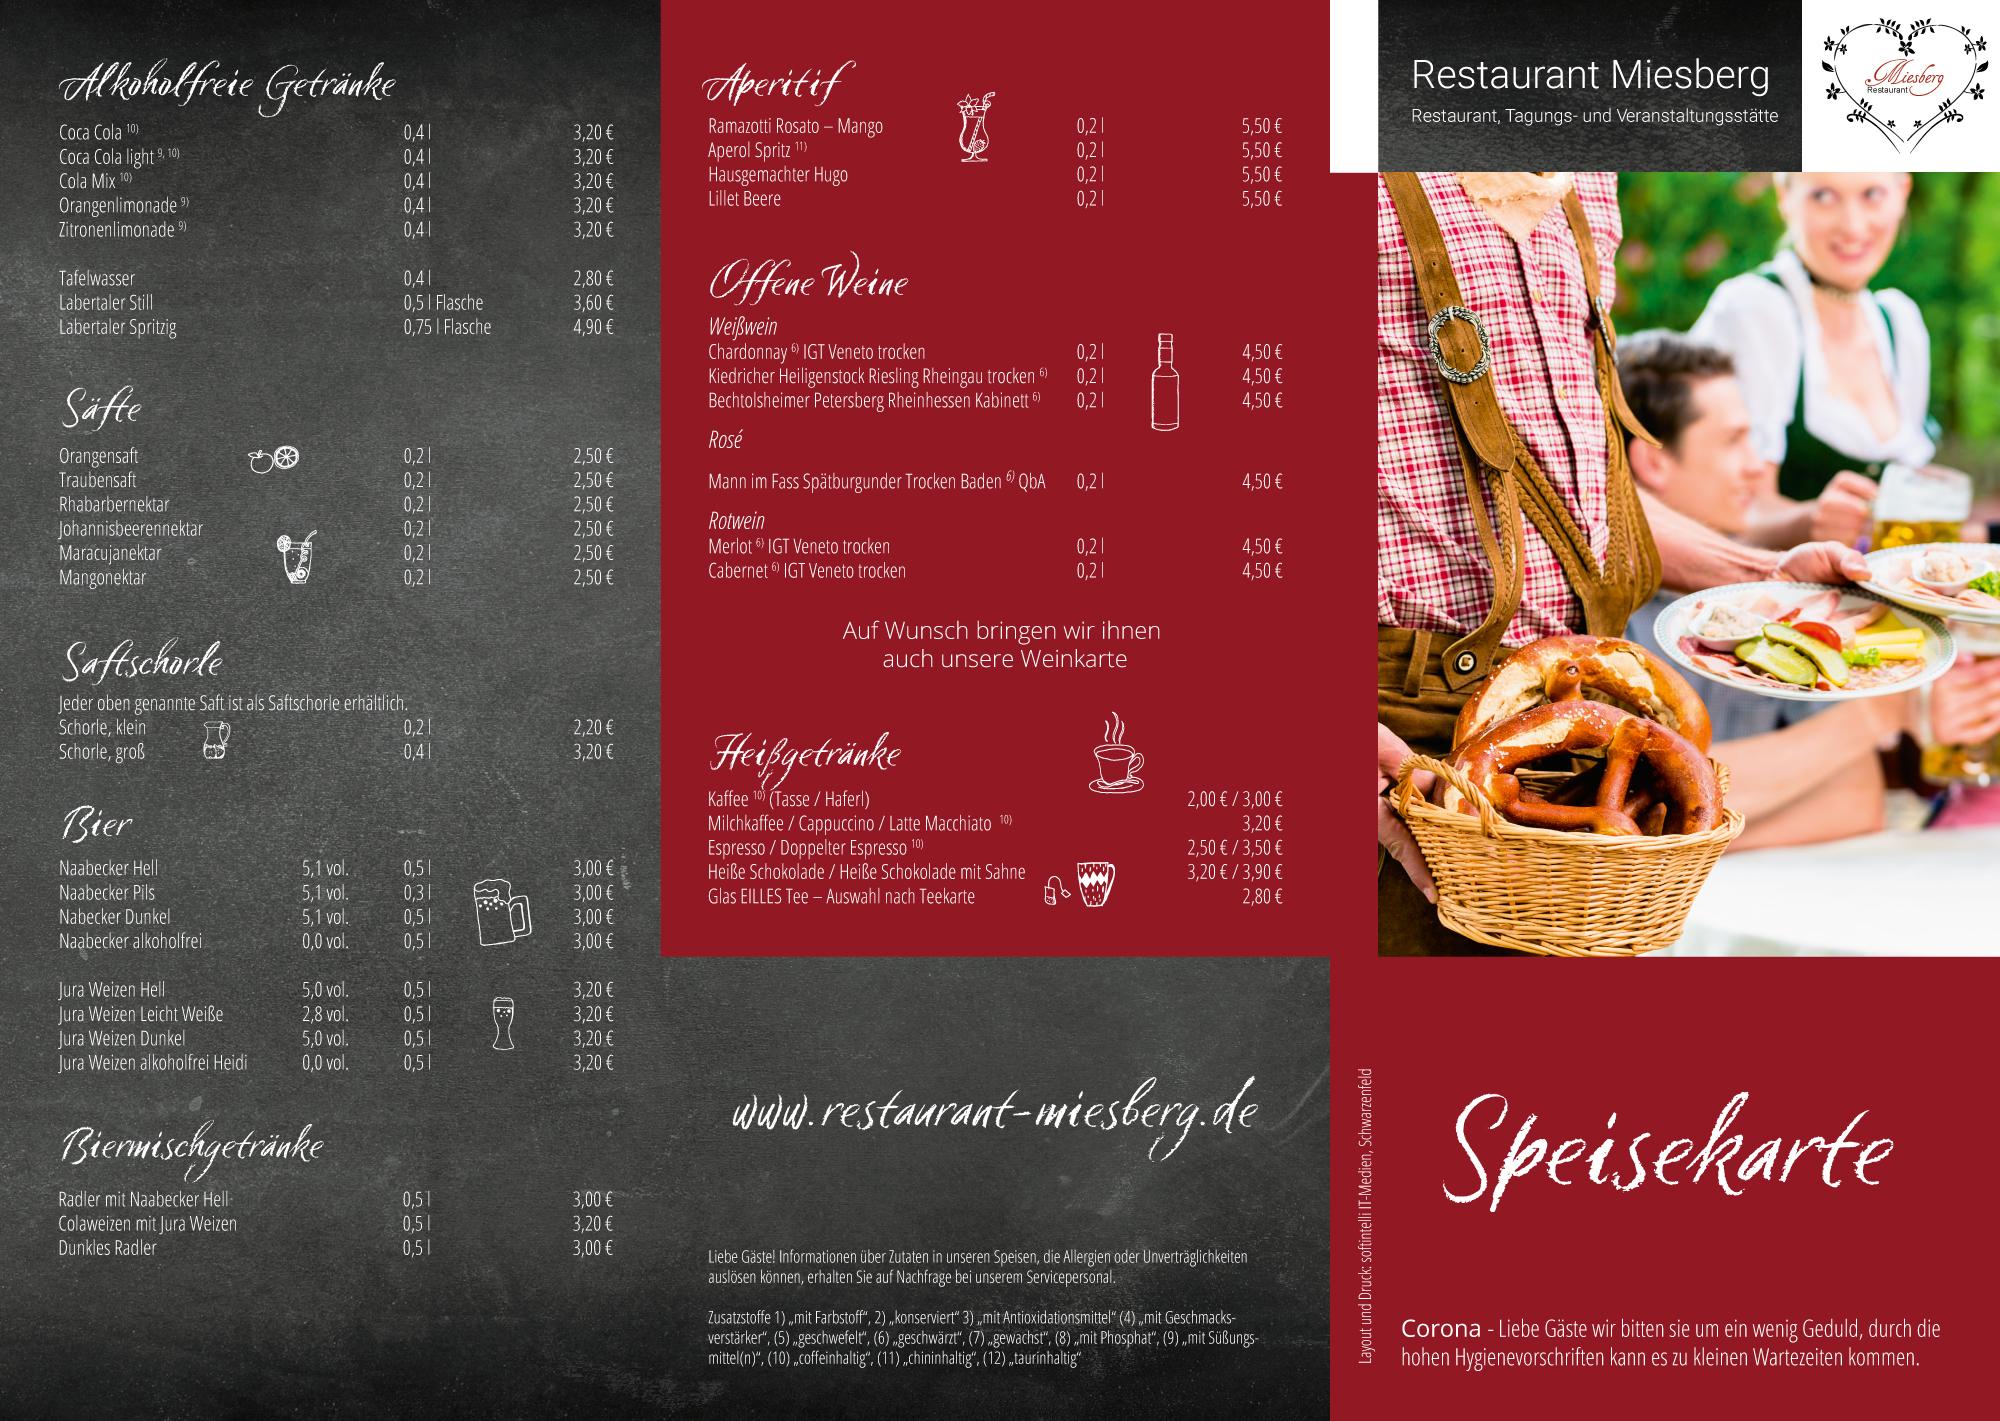 Biergartenkarte Restaurant Miesberg